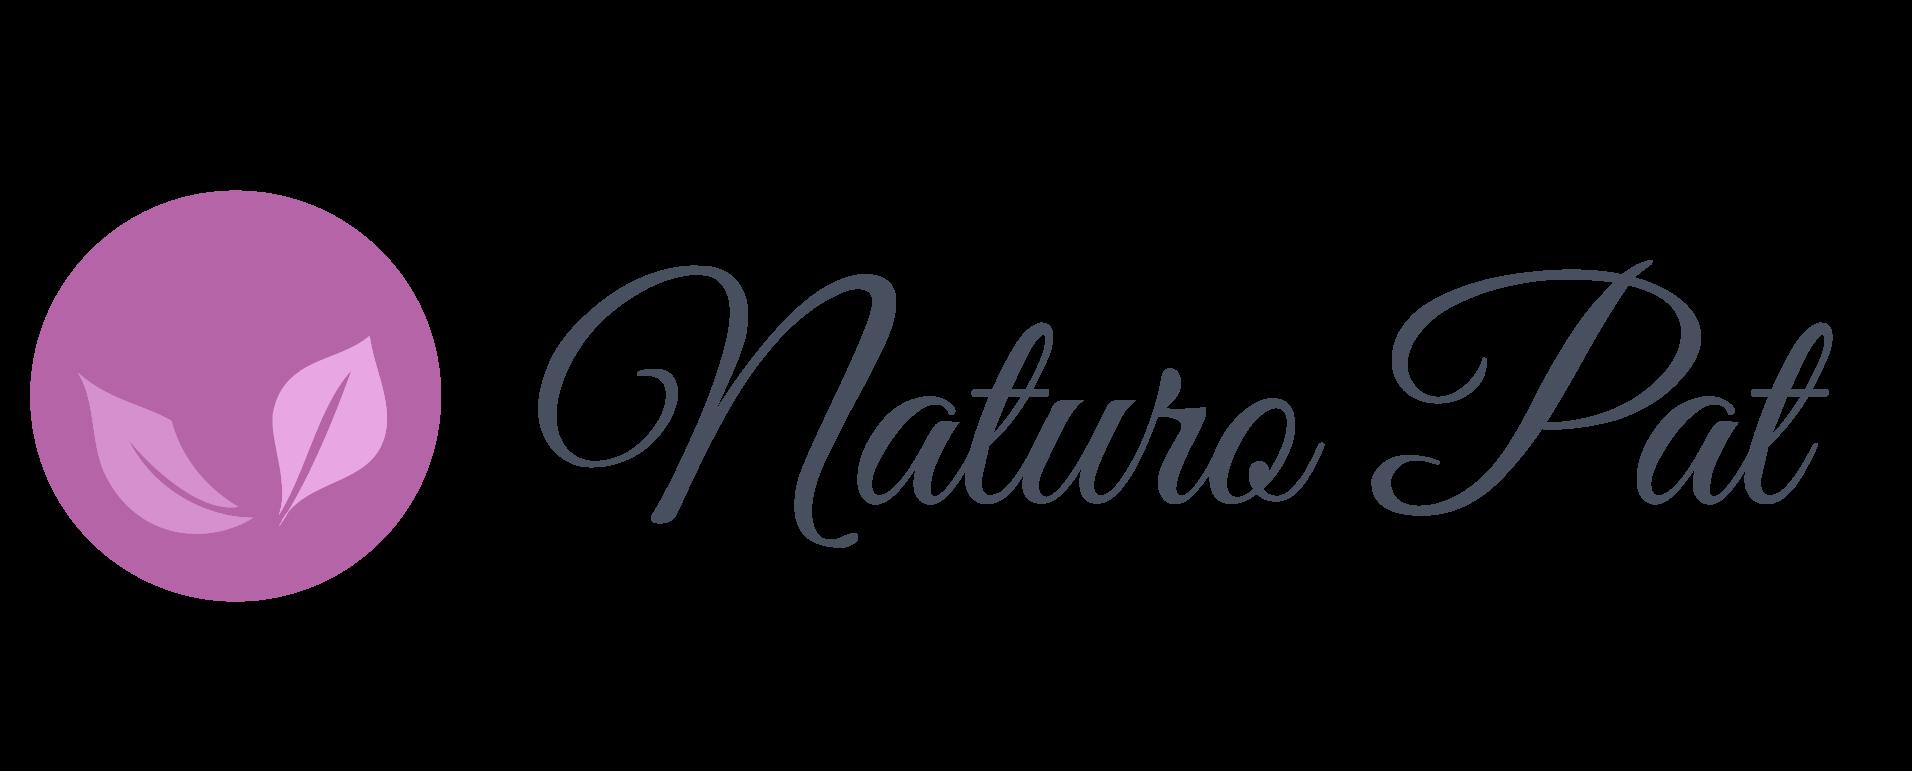 Naturo-pat